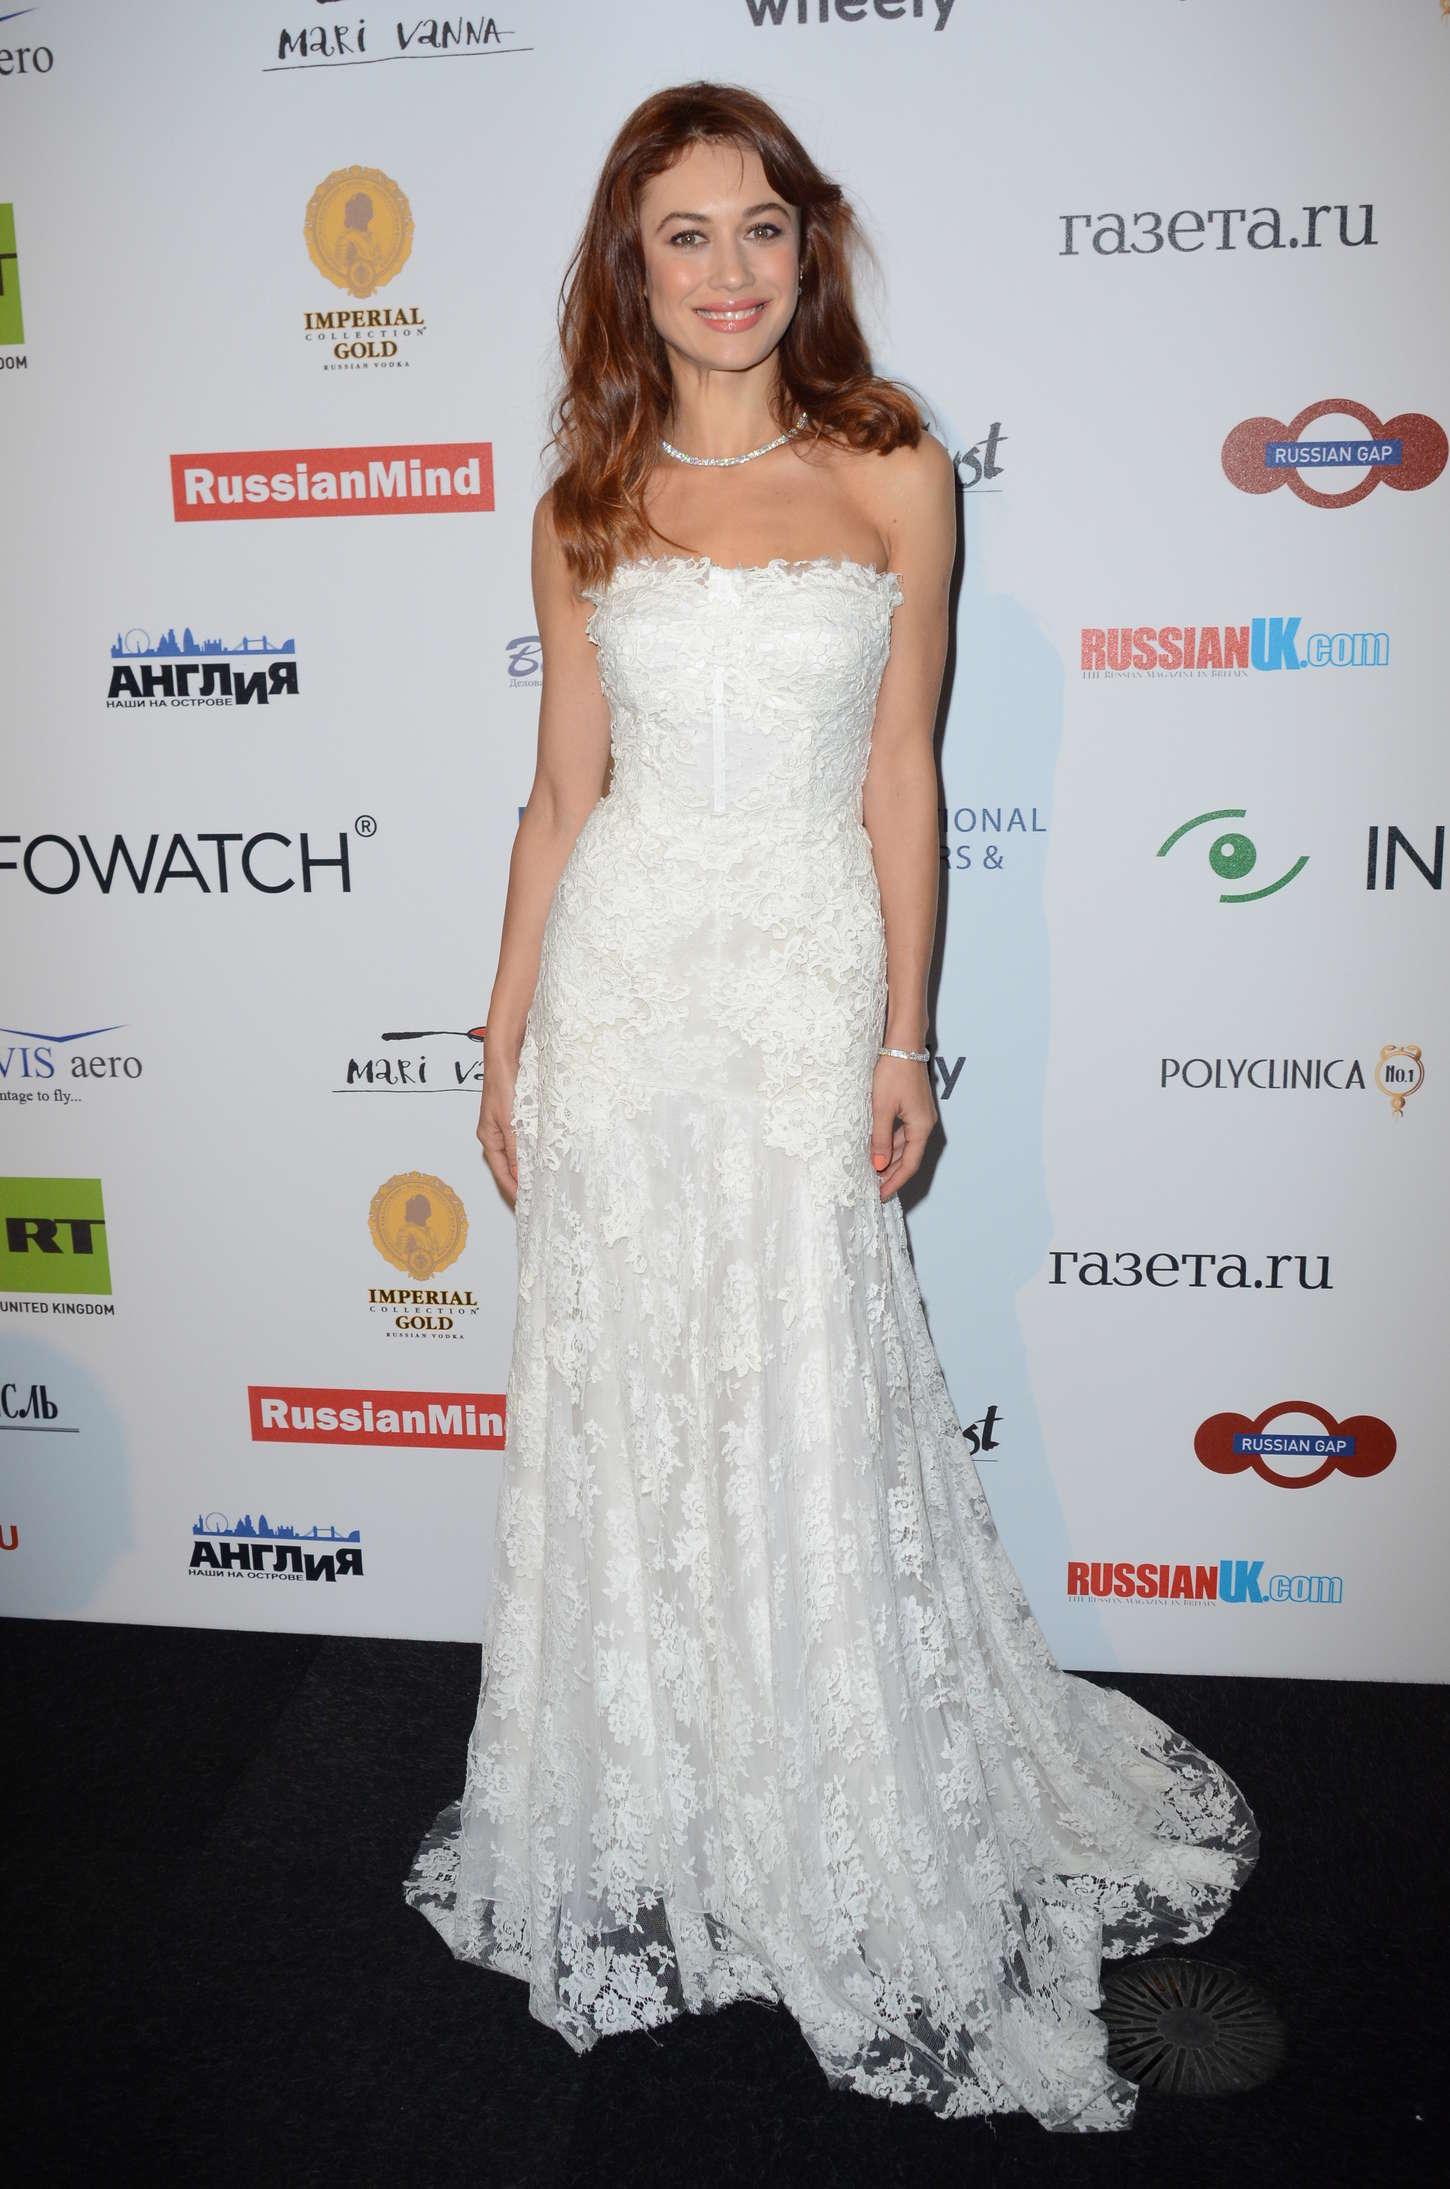 Olga Kurylenko - 2nd Annual Russian Ball in London